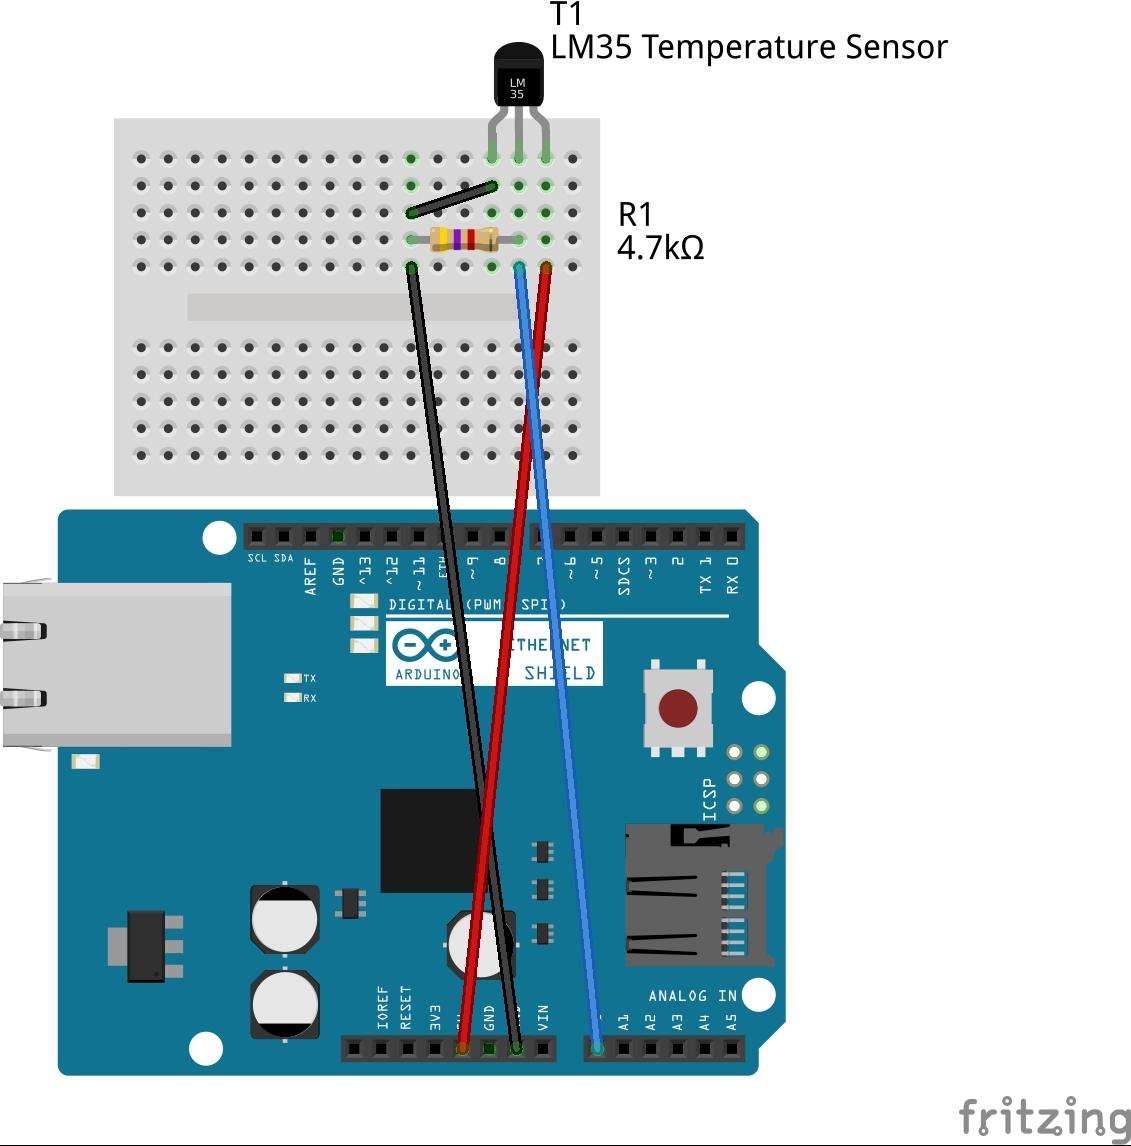 wotkit-example-arduino-sensor/GUIDE.md at master · SenseTecnic ...